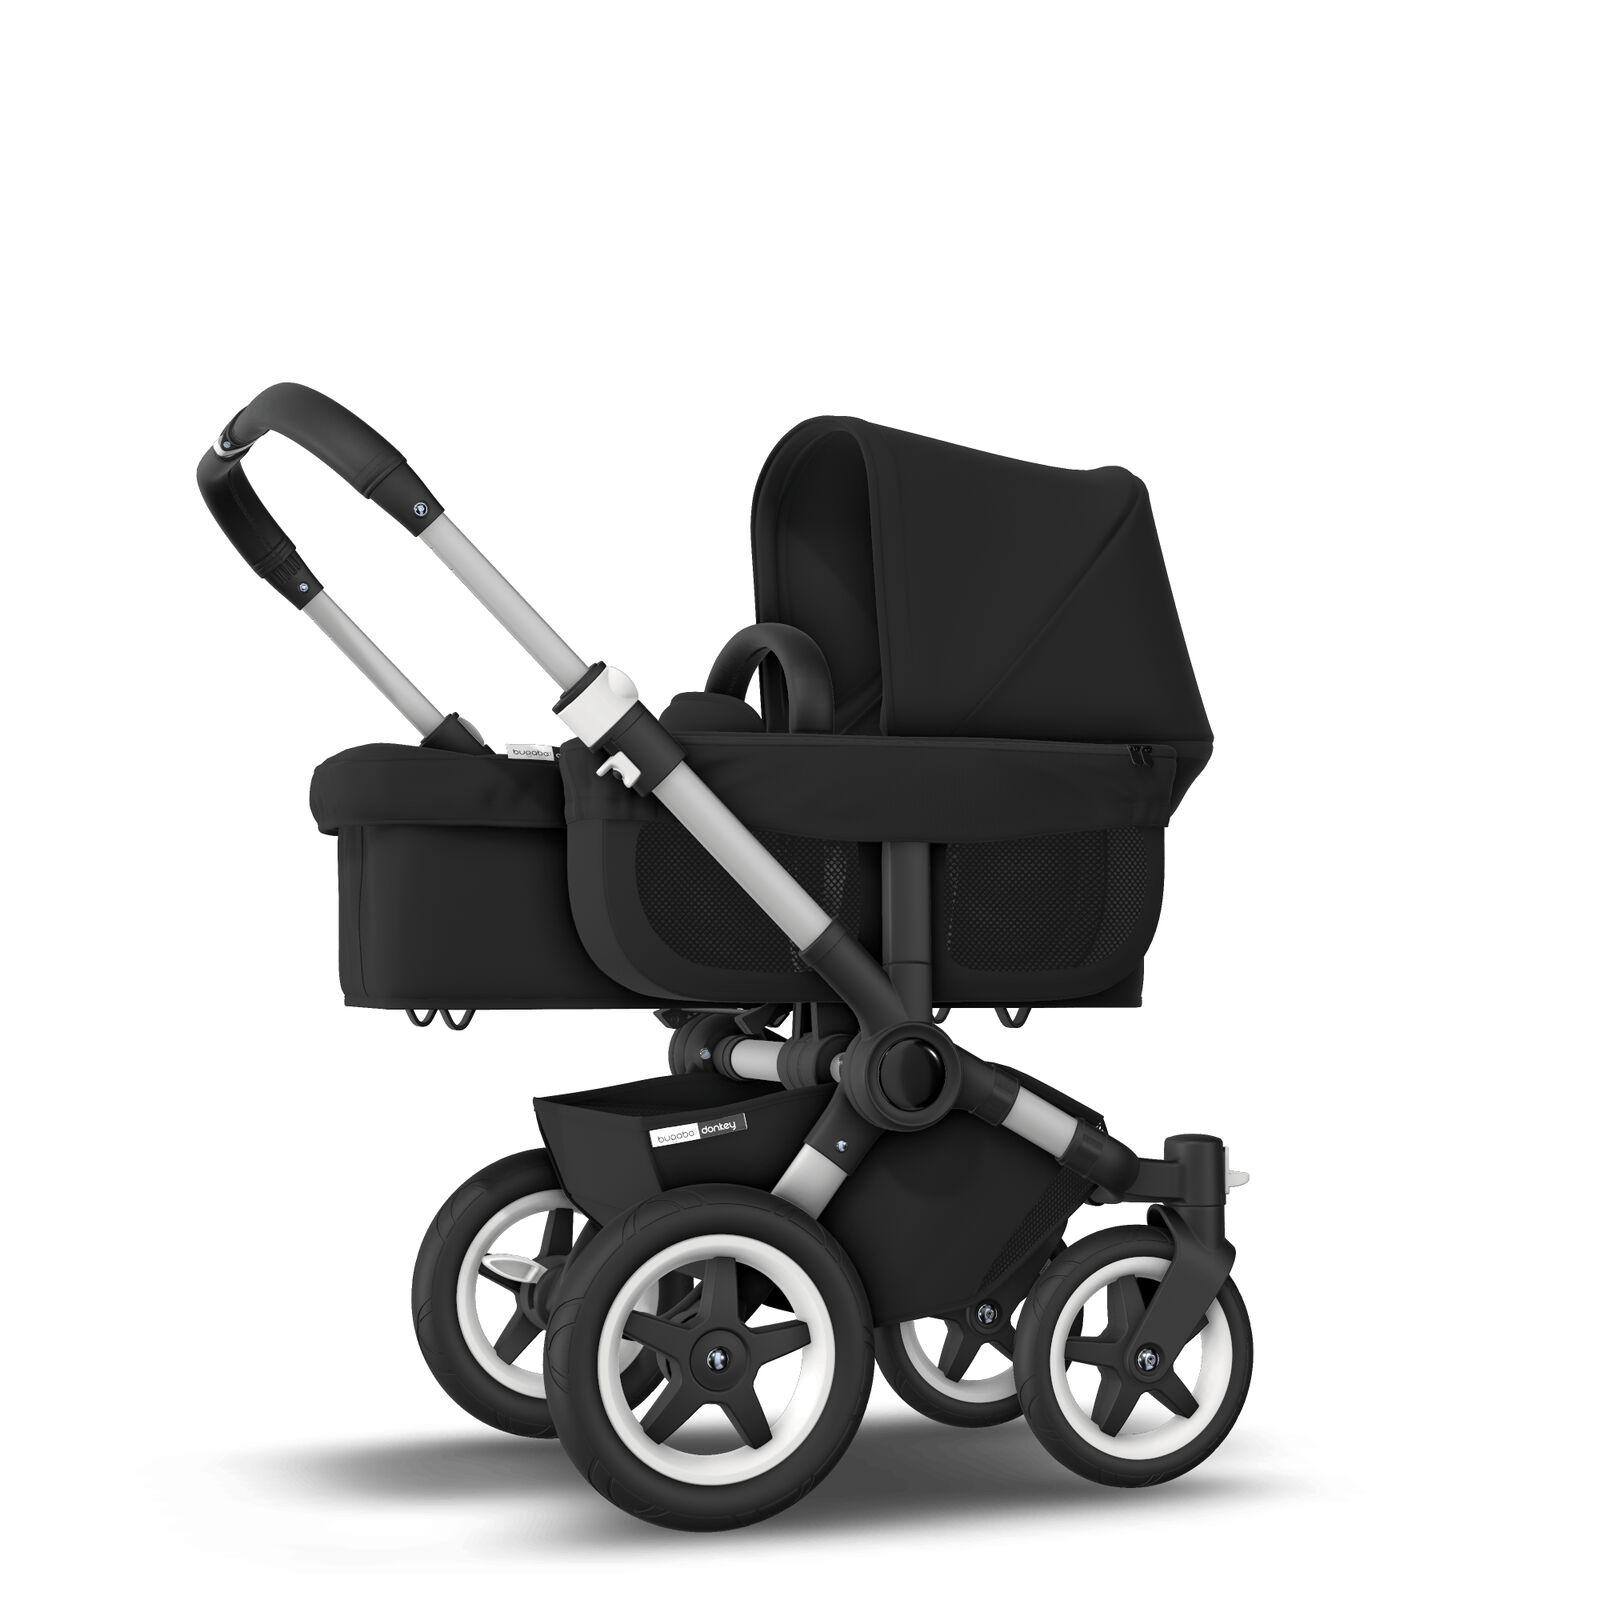 Bugaboo Donkey 2 Mono bassinet and seat stroller